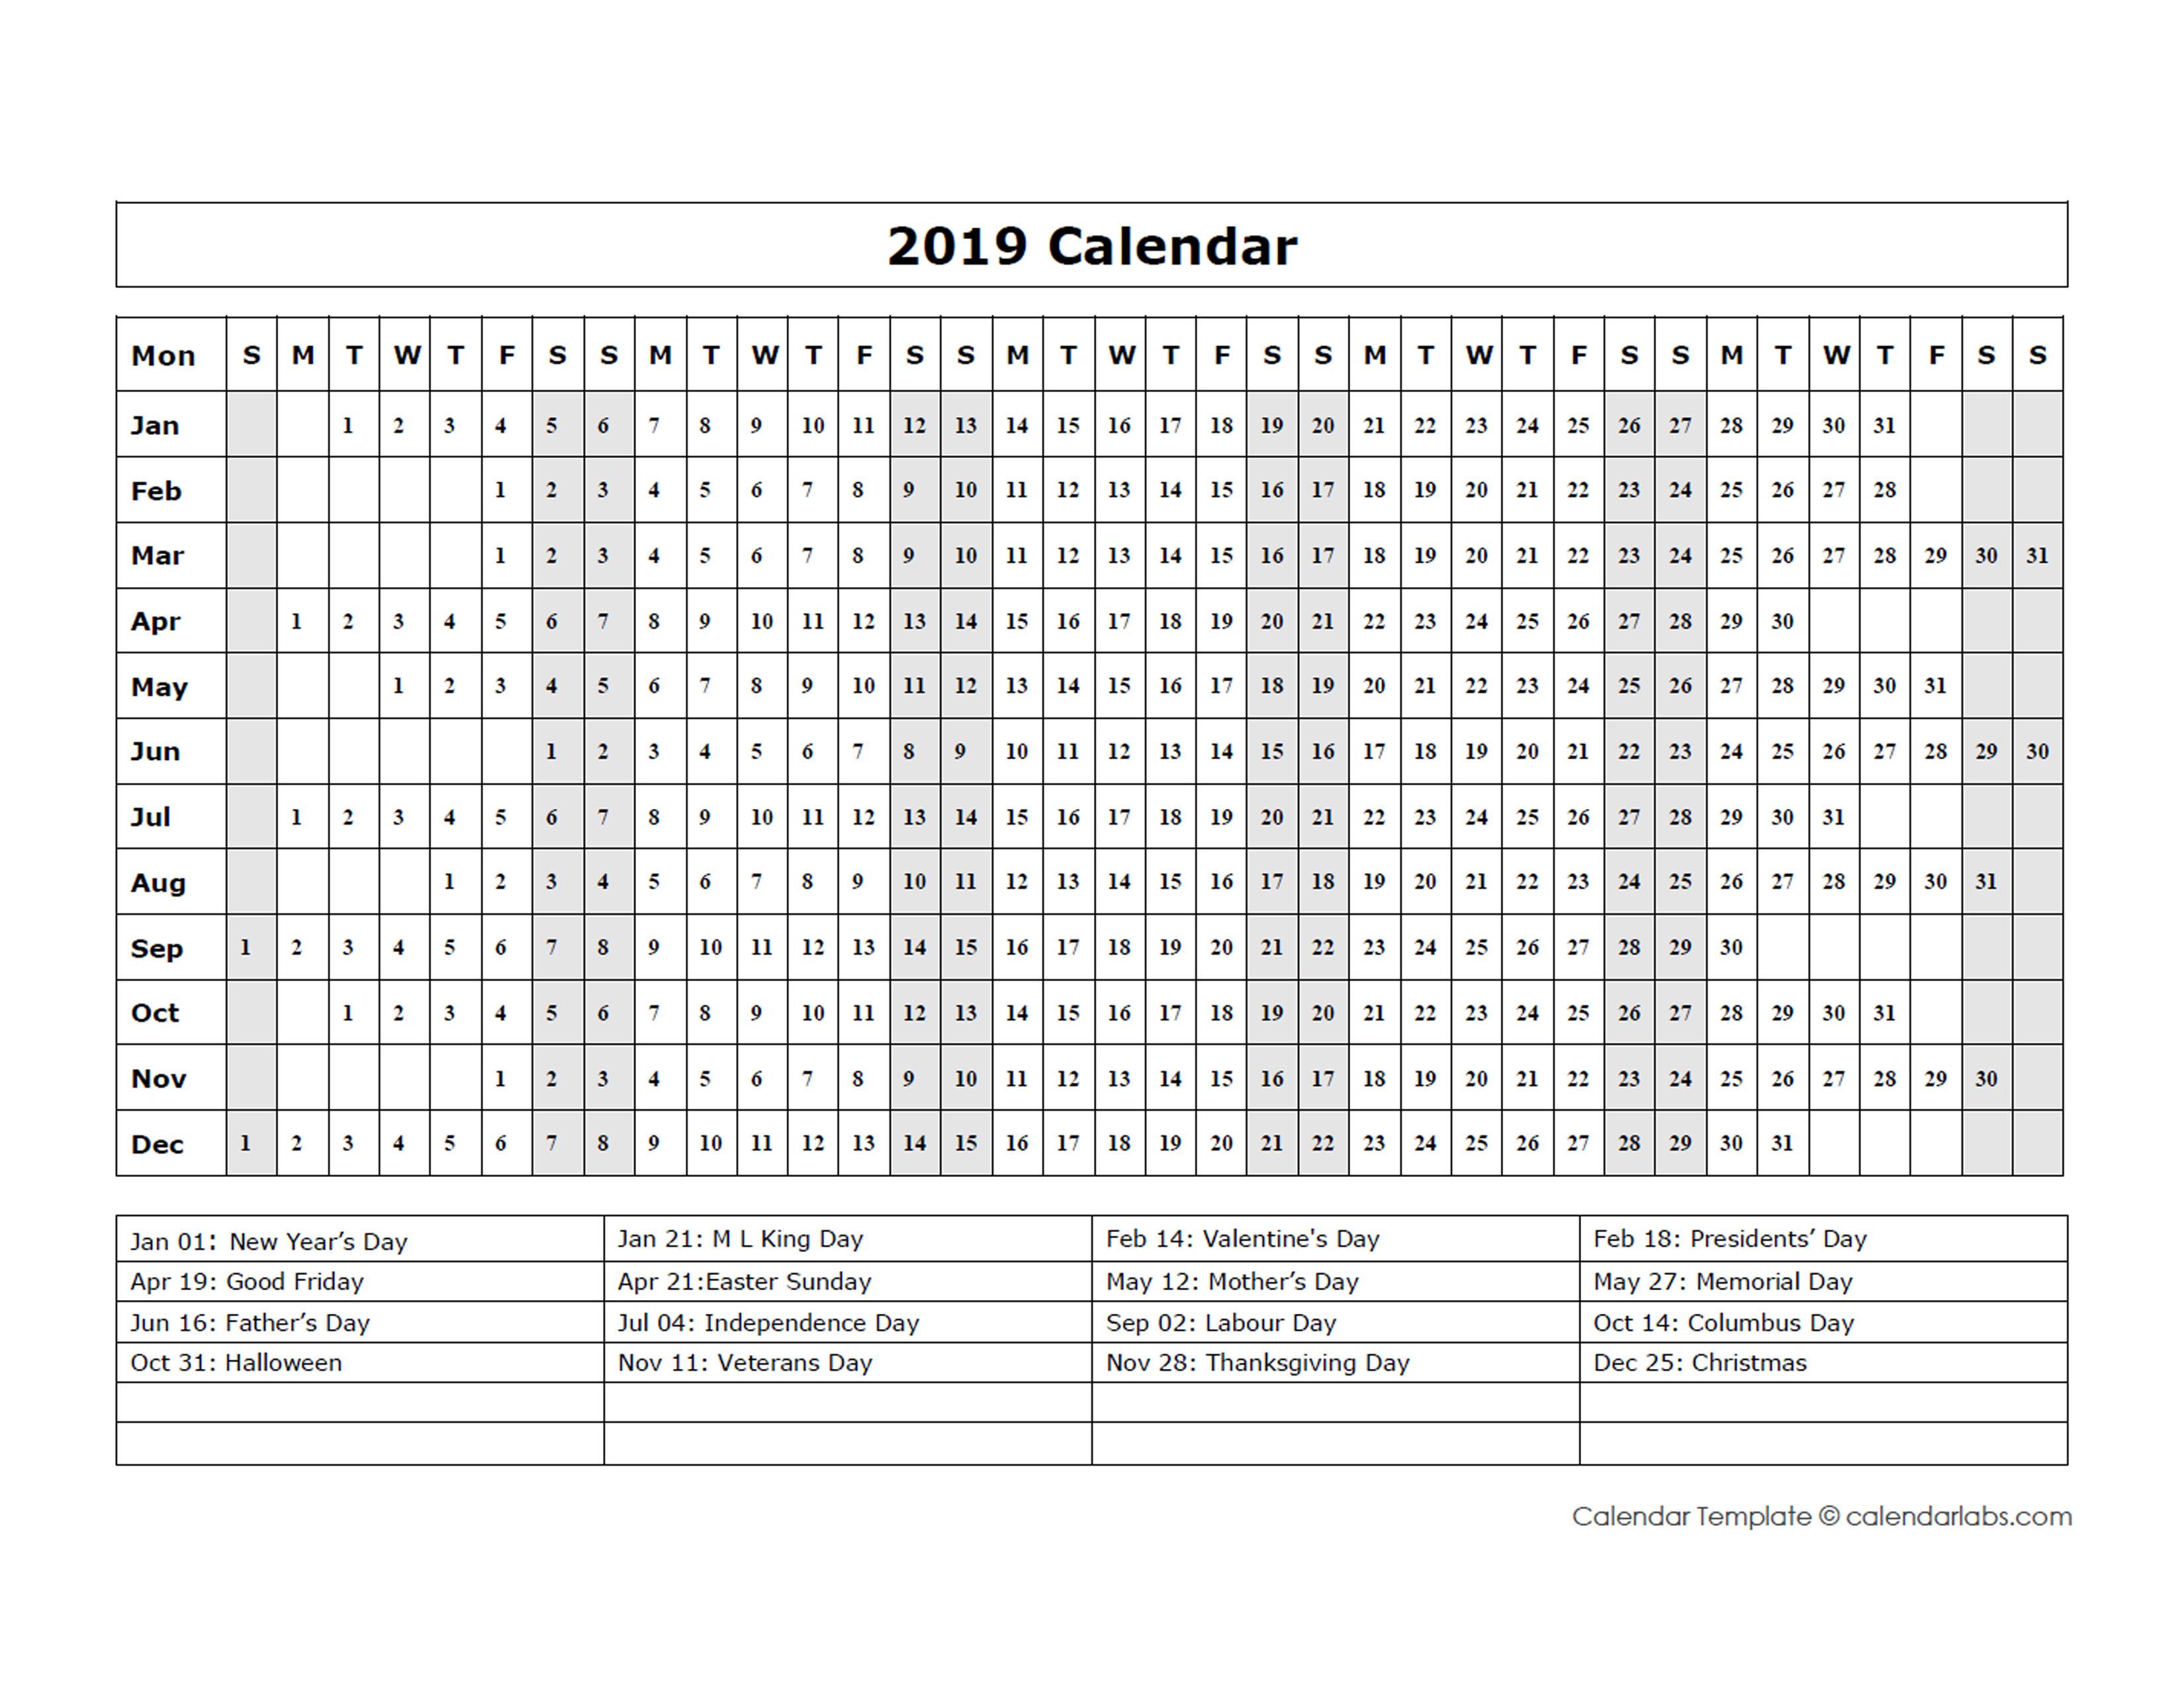 Calendar Templates Year At A Glance : Calendar template year at a glance free printable